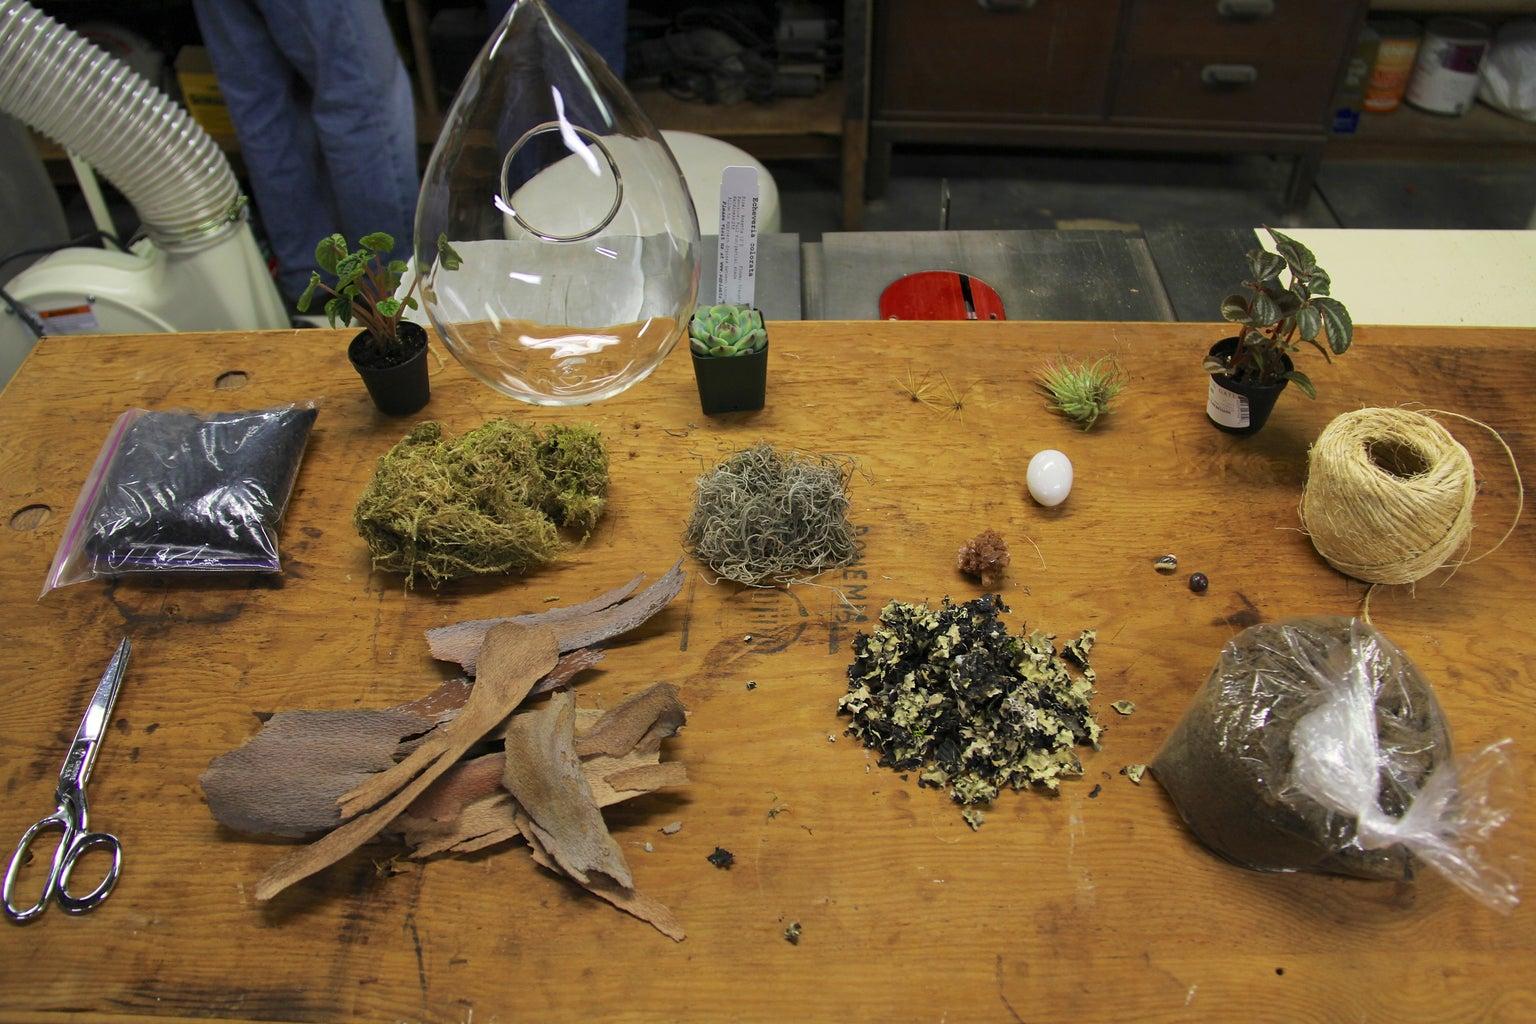 What You'll Need to Make a Terrarium